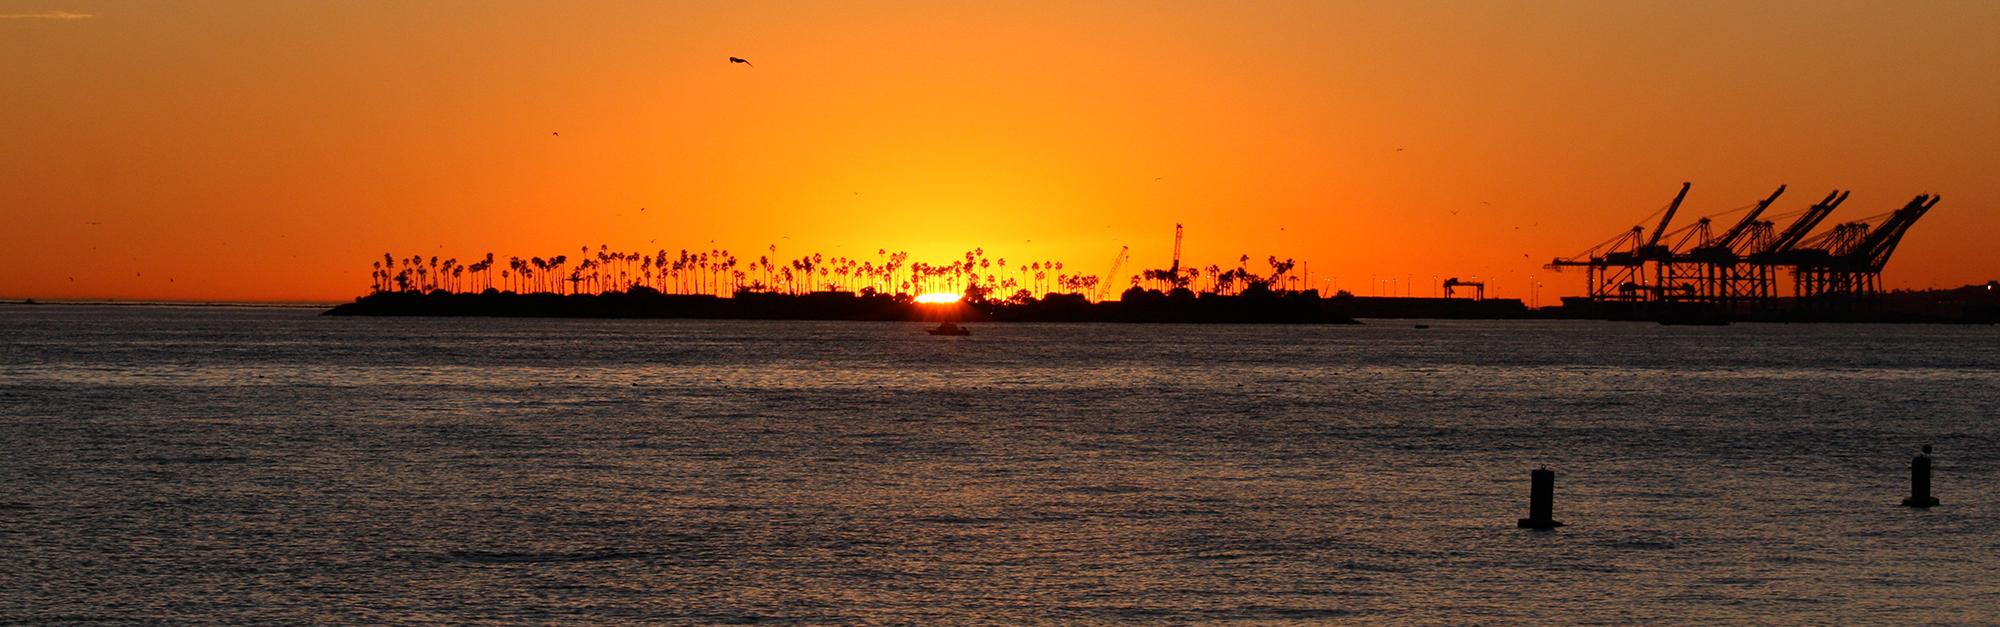 sunset_harbour_Panorama_15625